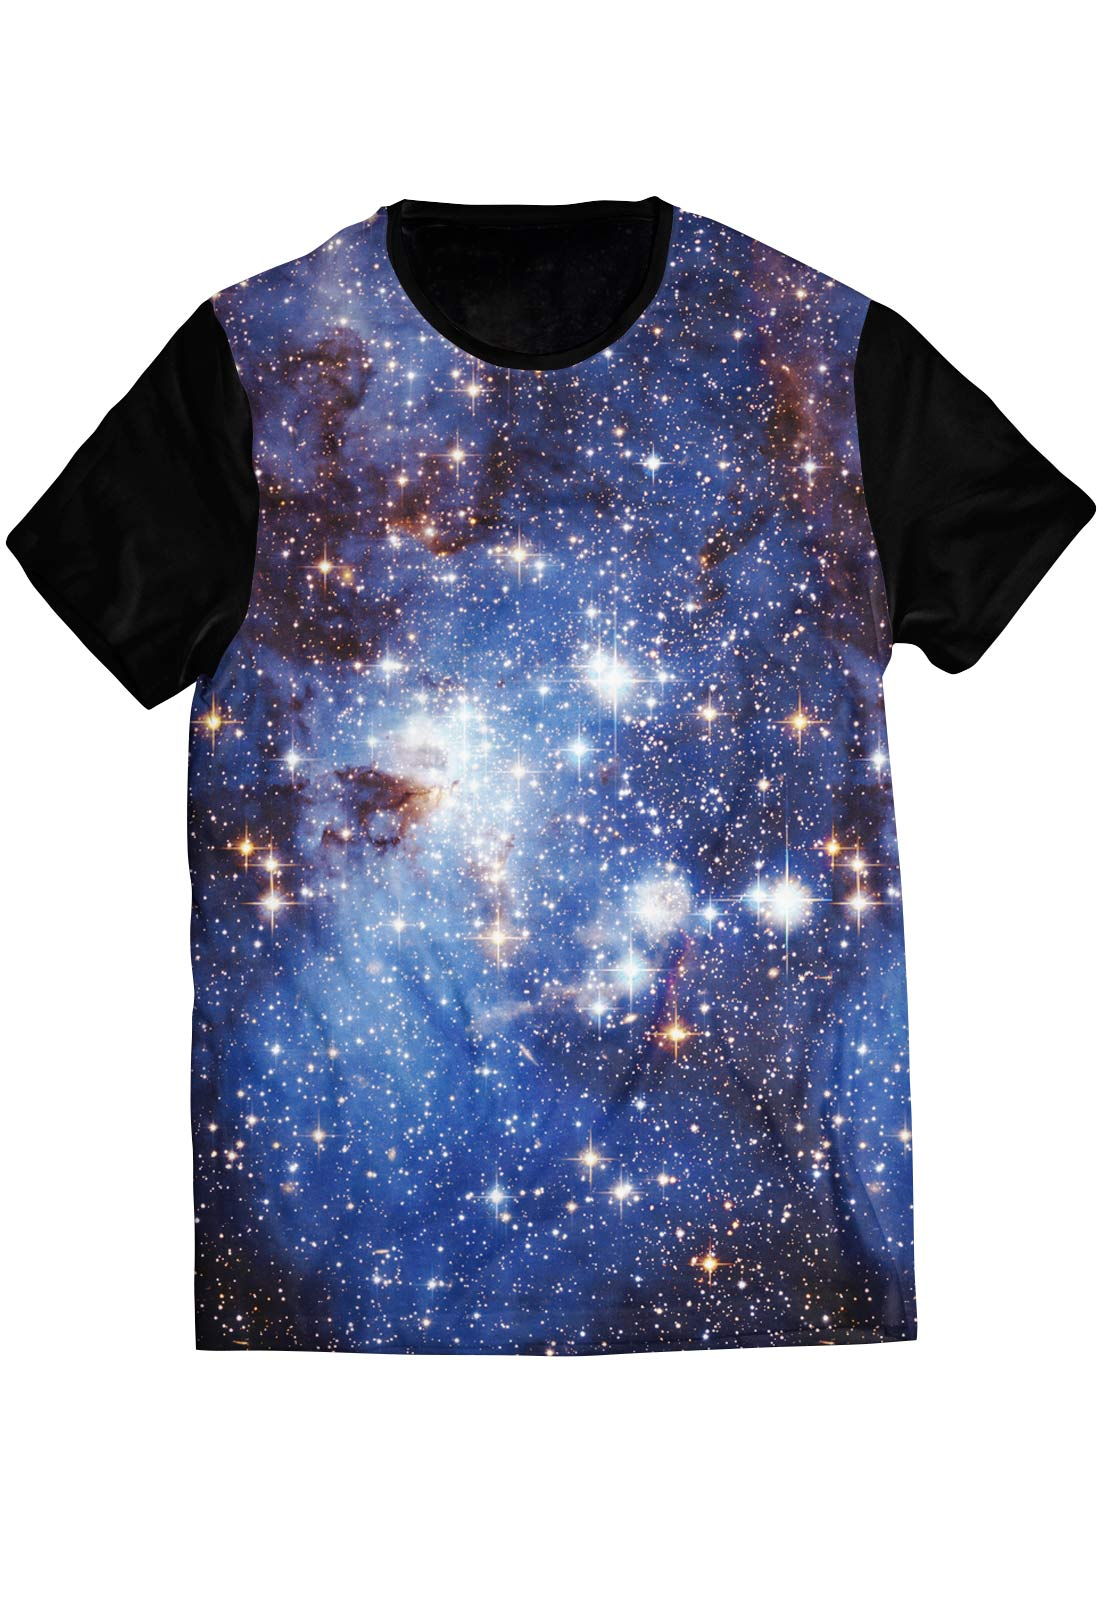 Camiseta Galaxy ElephunK Estampada Estrelas Universo Preta